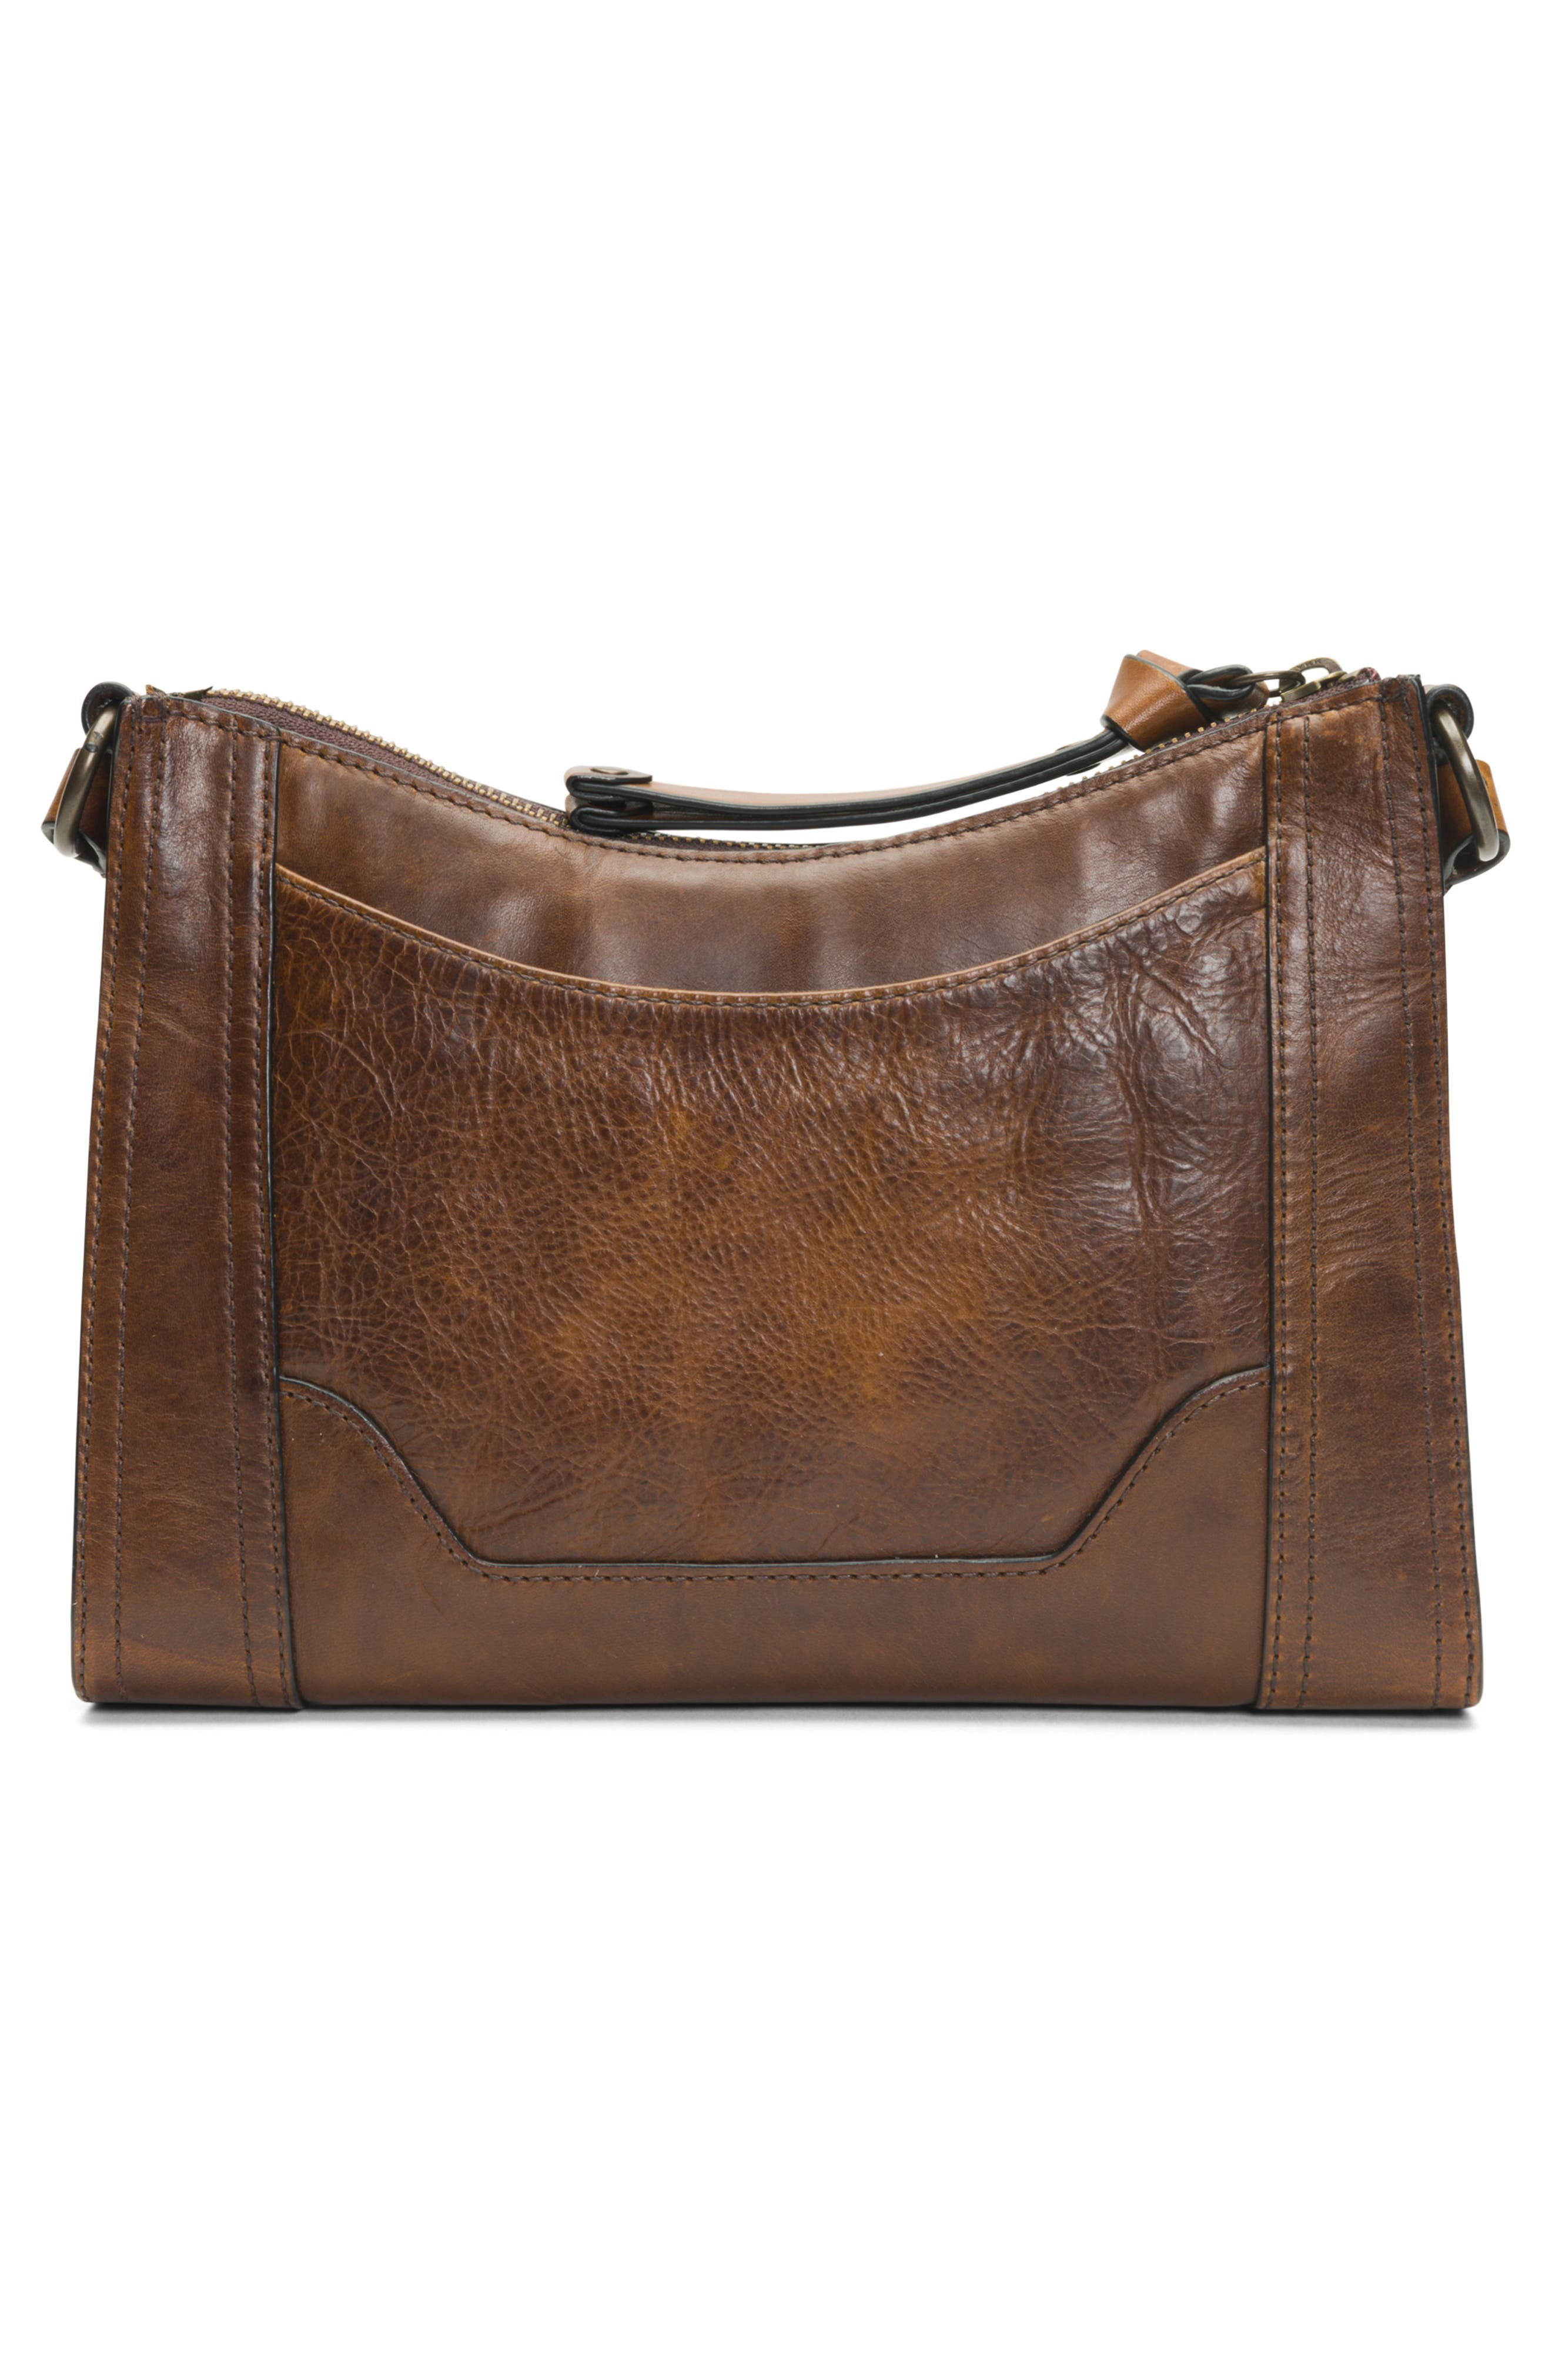 Melissa Leather Crossbody Bag,                             Alternate thumbnail 3, color,                             DARK BROWN